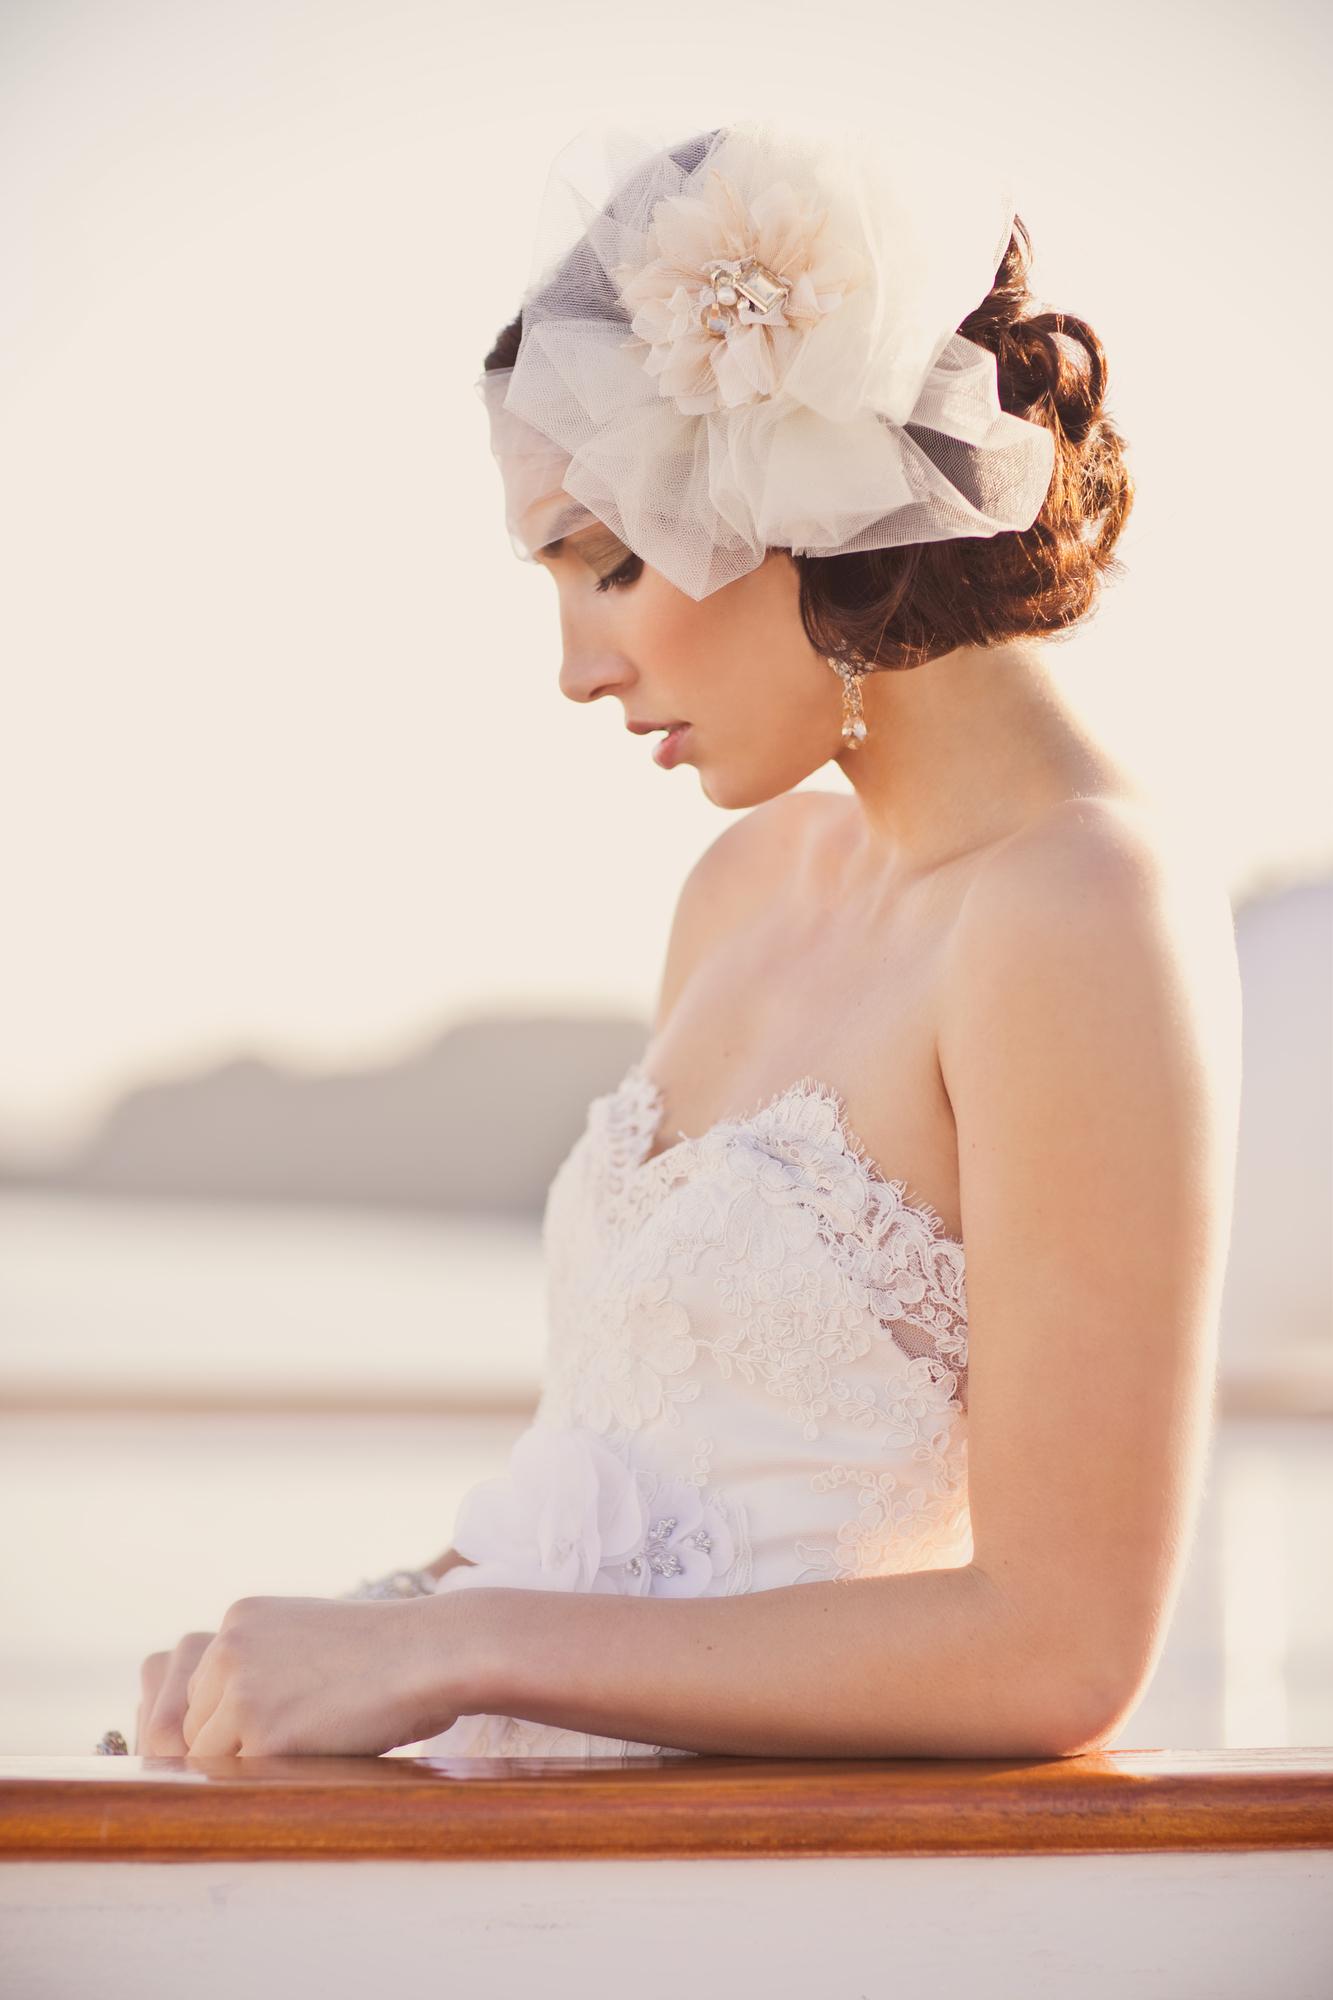 jennifer-skog-bridal-fashion-photographer-lifestyle-0016.jpg